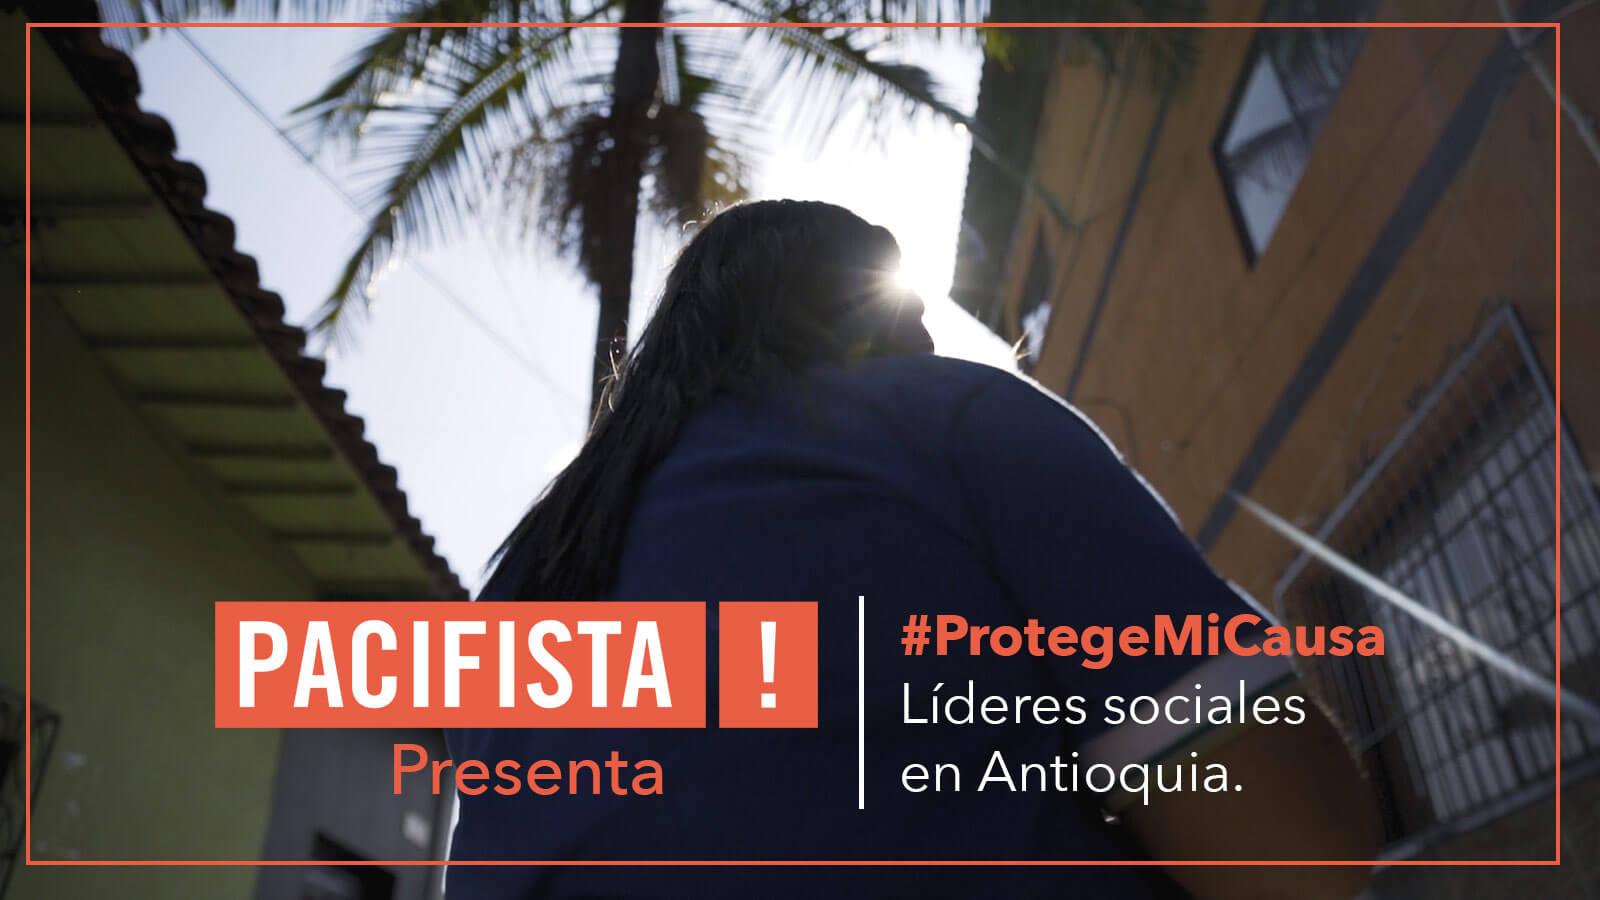 ¡Pacifista! Presenta: #ProtegeMiCausa Líderes sociales en Antioquía